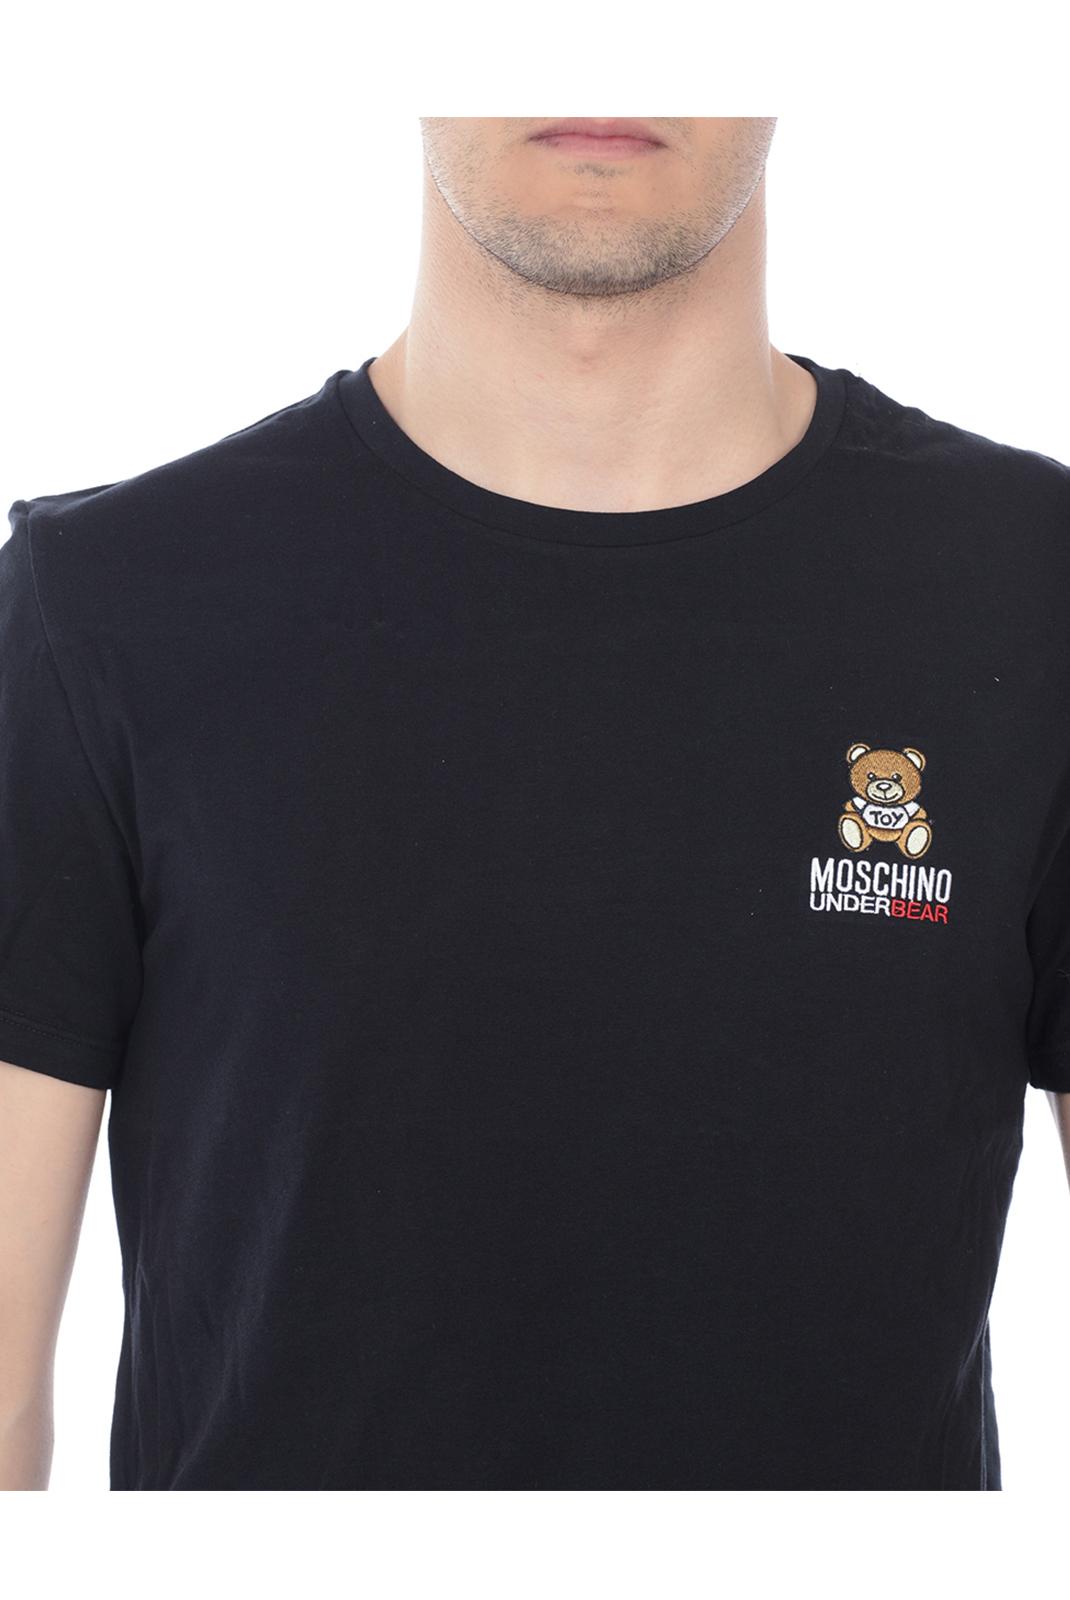 Tee-shirts  Moschino A1905 0555 NOIR